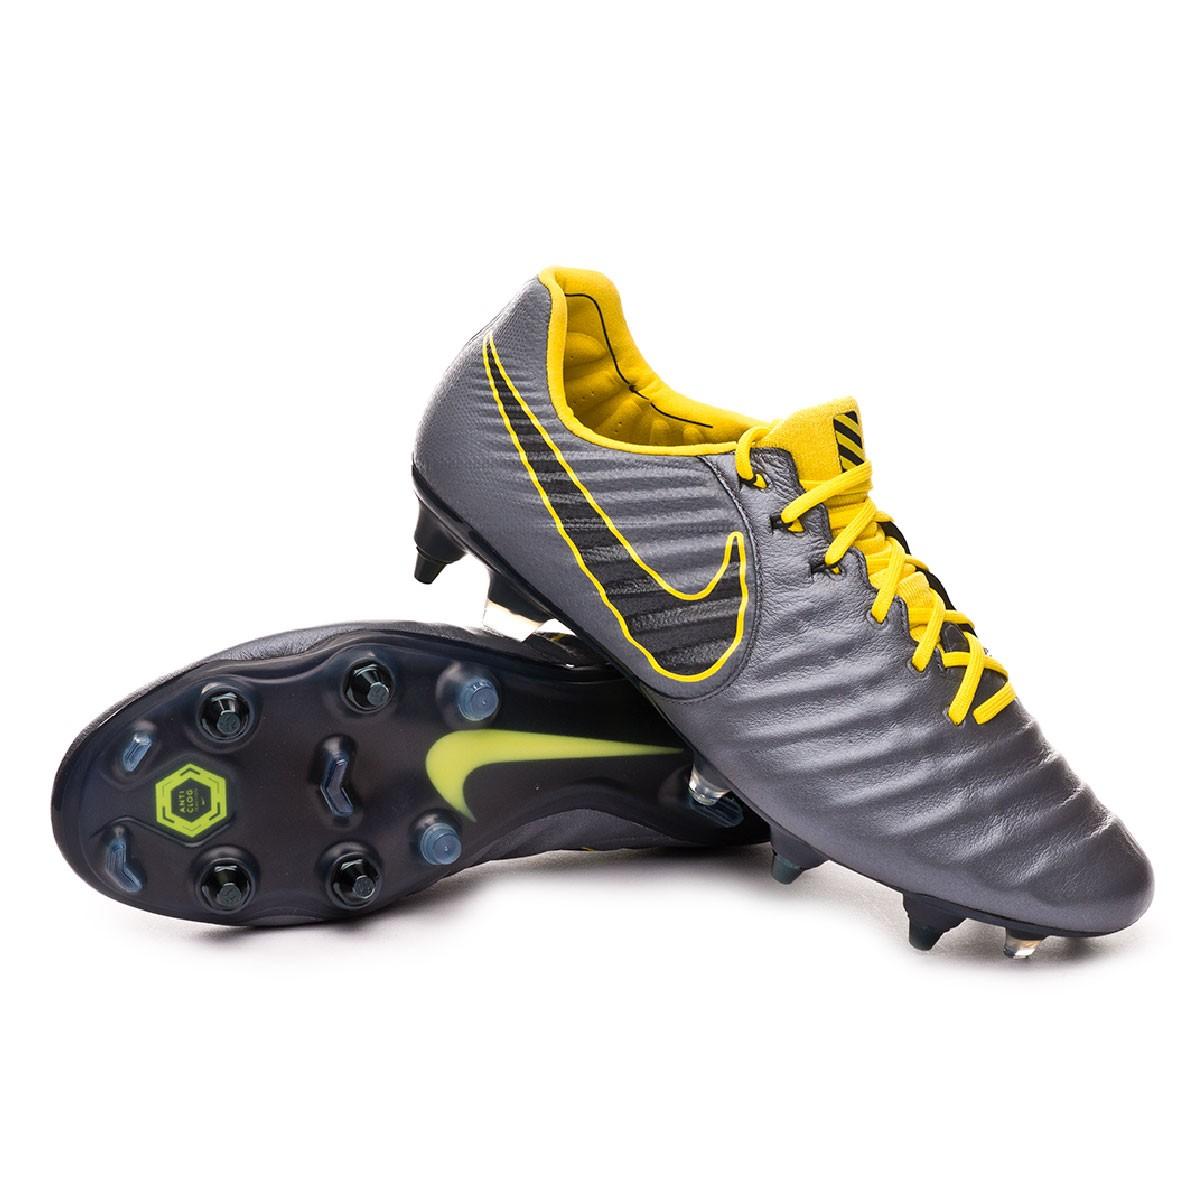 cf03f3c5f58 Football Boots Nike Tiempo Legend VII Elite Anti-Clog SG-Pro Dark grey-Optical  yellow-Black - Tienda de fútbol Fútbol Emotion